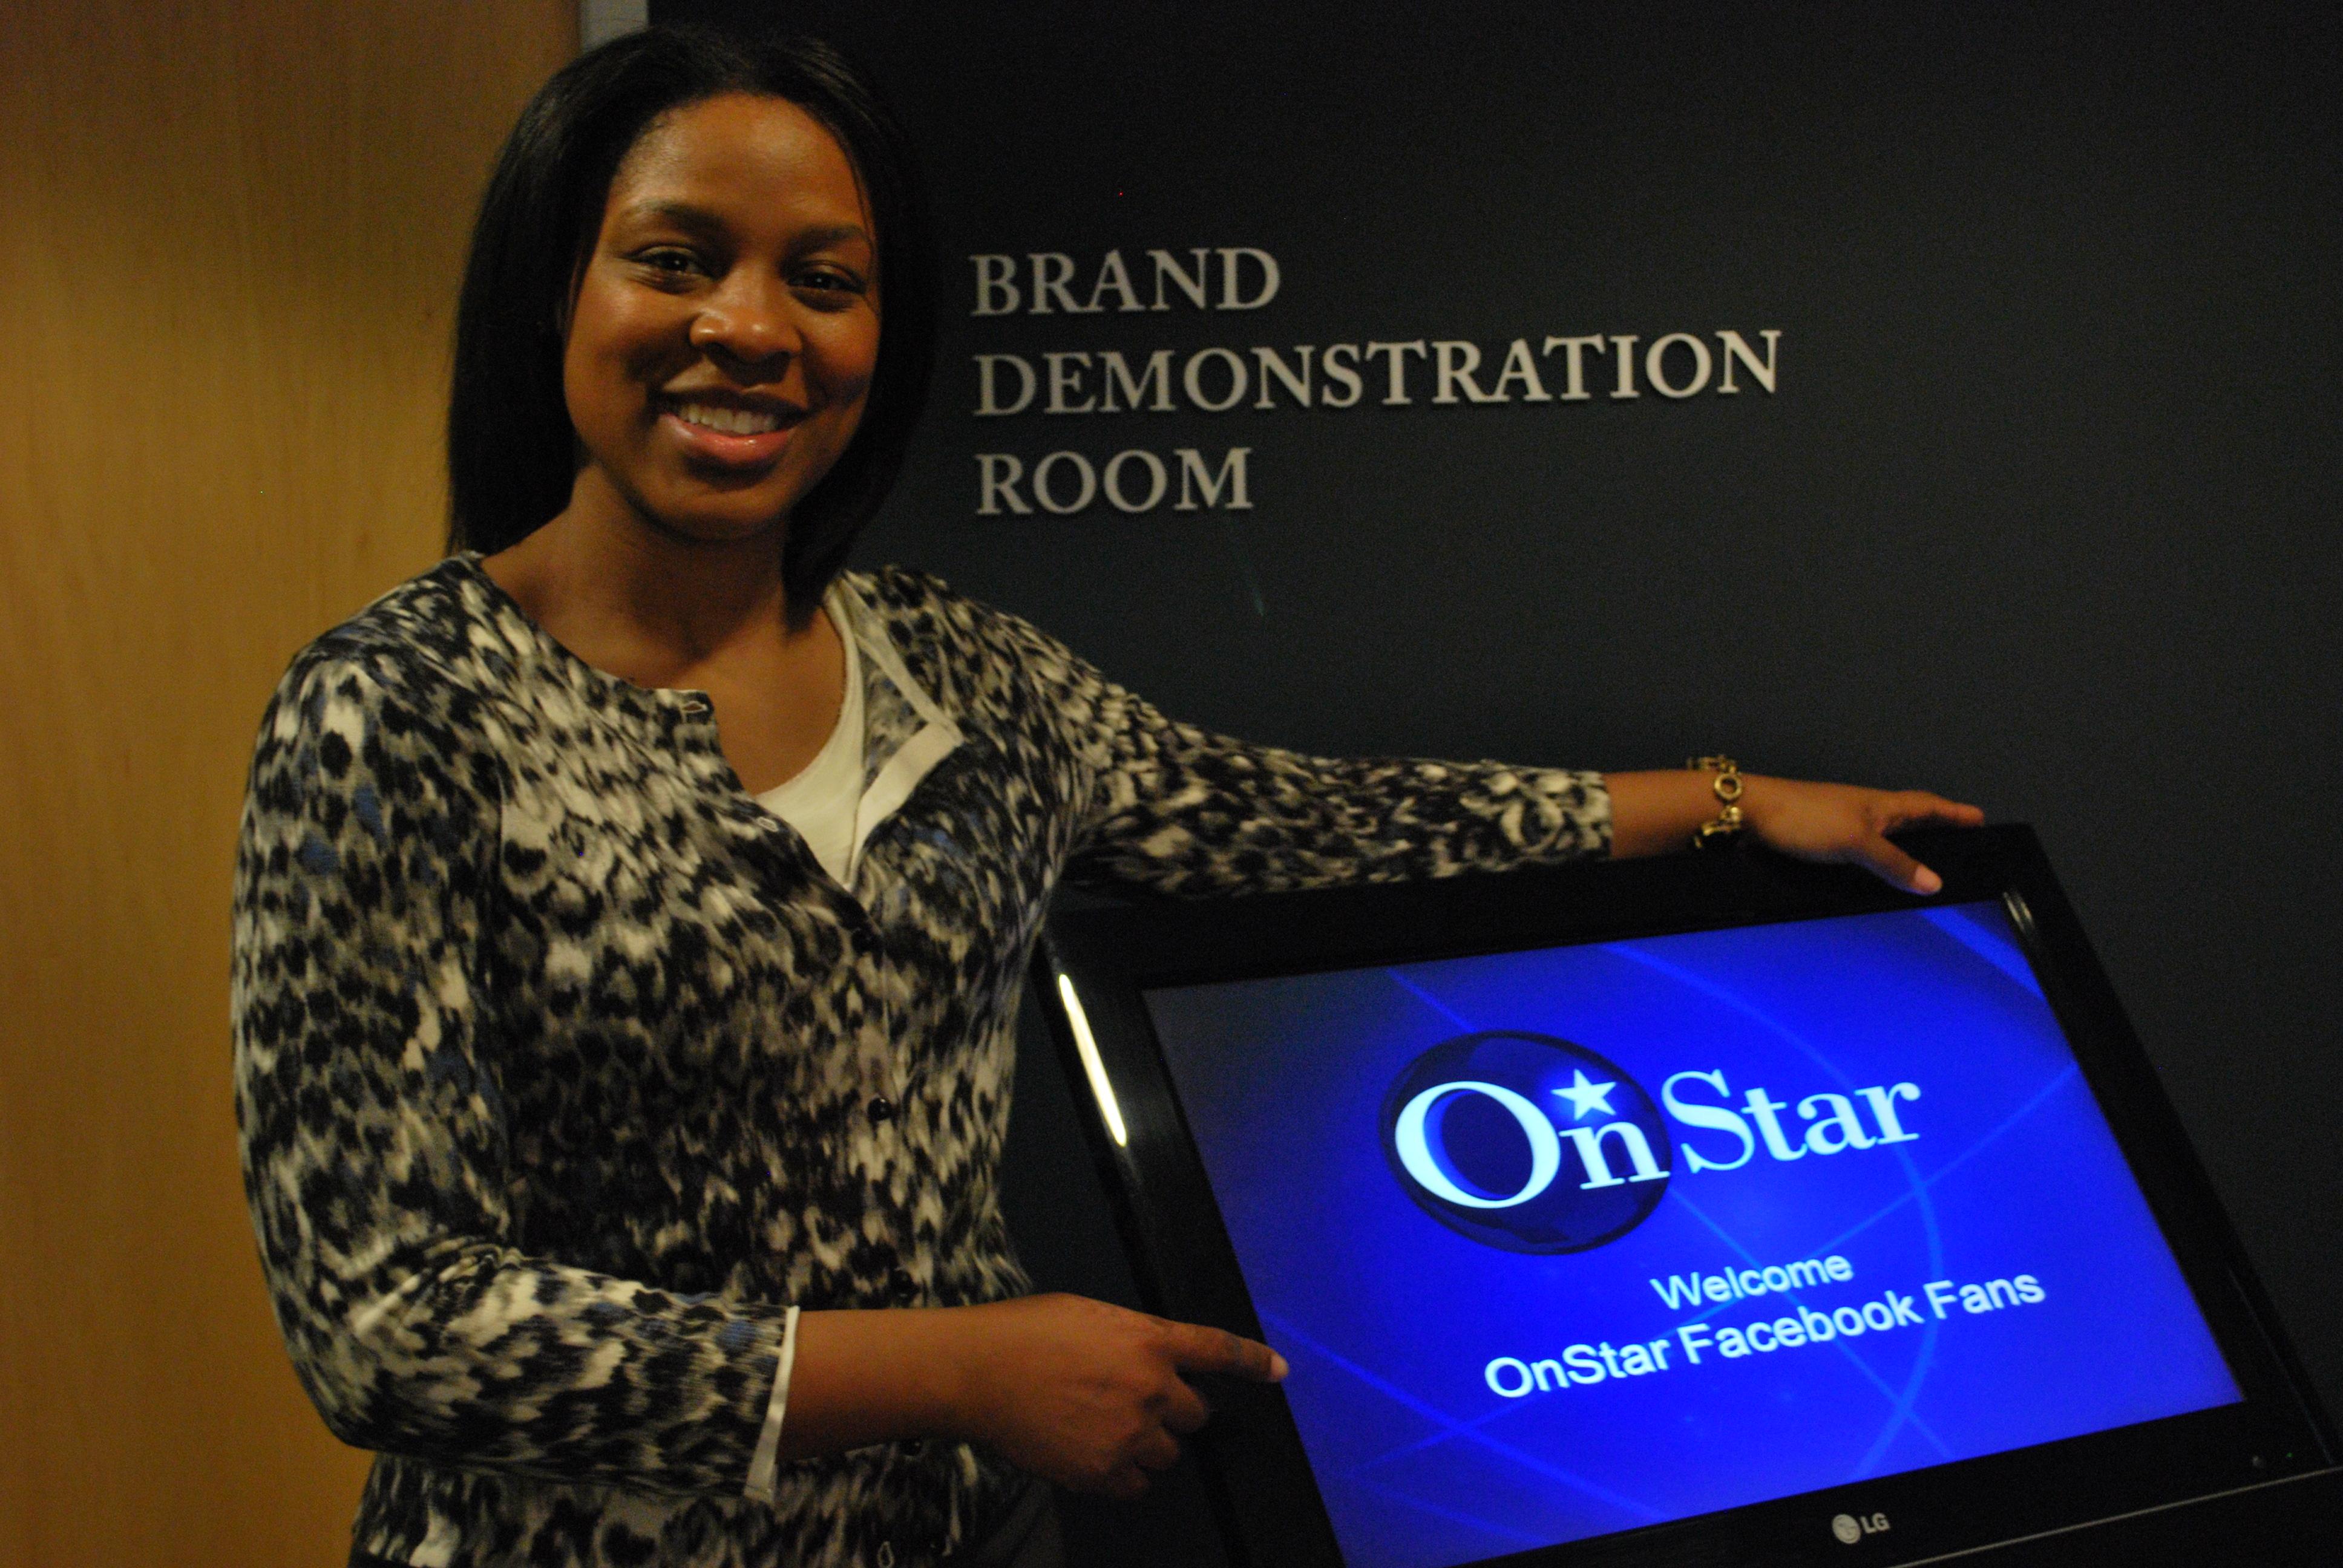 OnStar Command Center